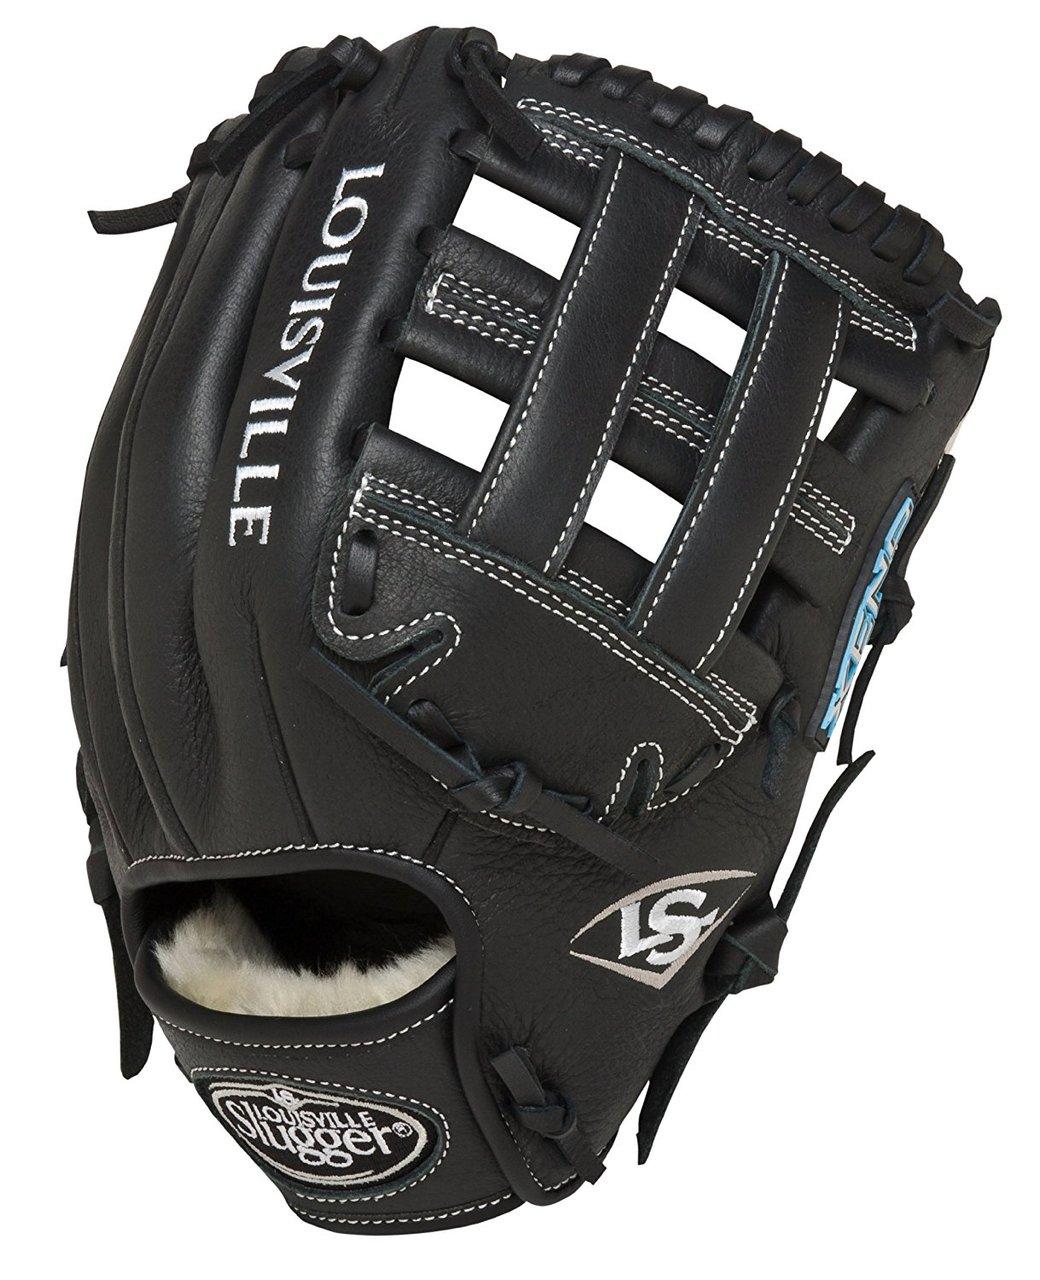 louisville-slugger-11-75-inch-fg-xeno-softball-infielders-gloves-black-right-hand-throw FGXN14-BK117-RightHandThrow Louisville 044277007980 Size 11.75 Softball Infielders Gloves Premium grade oil-treated leather for soft